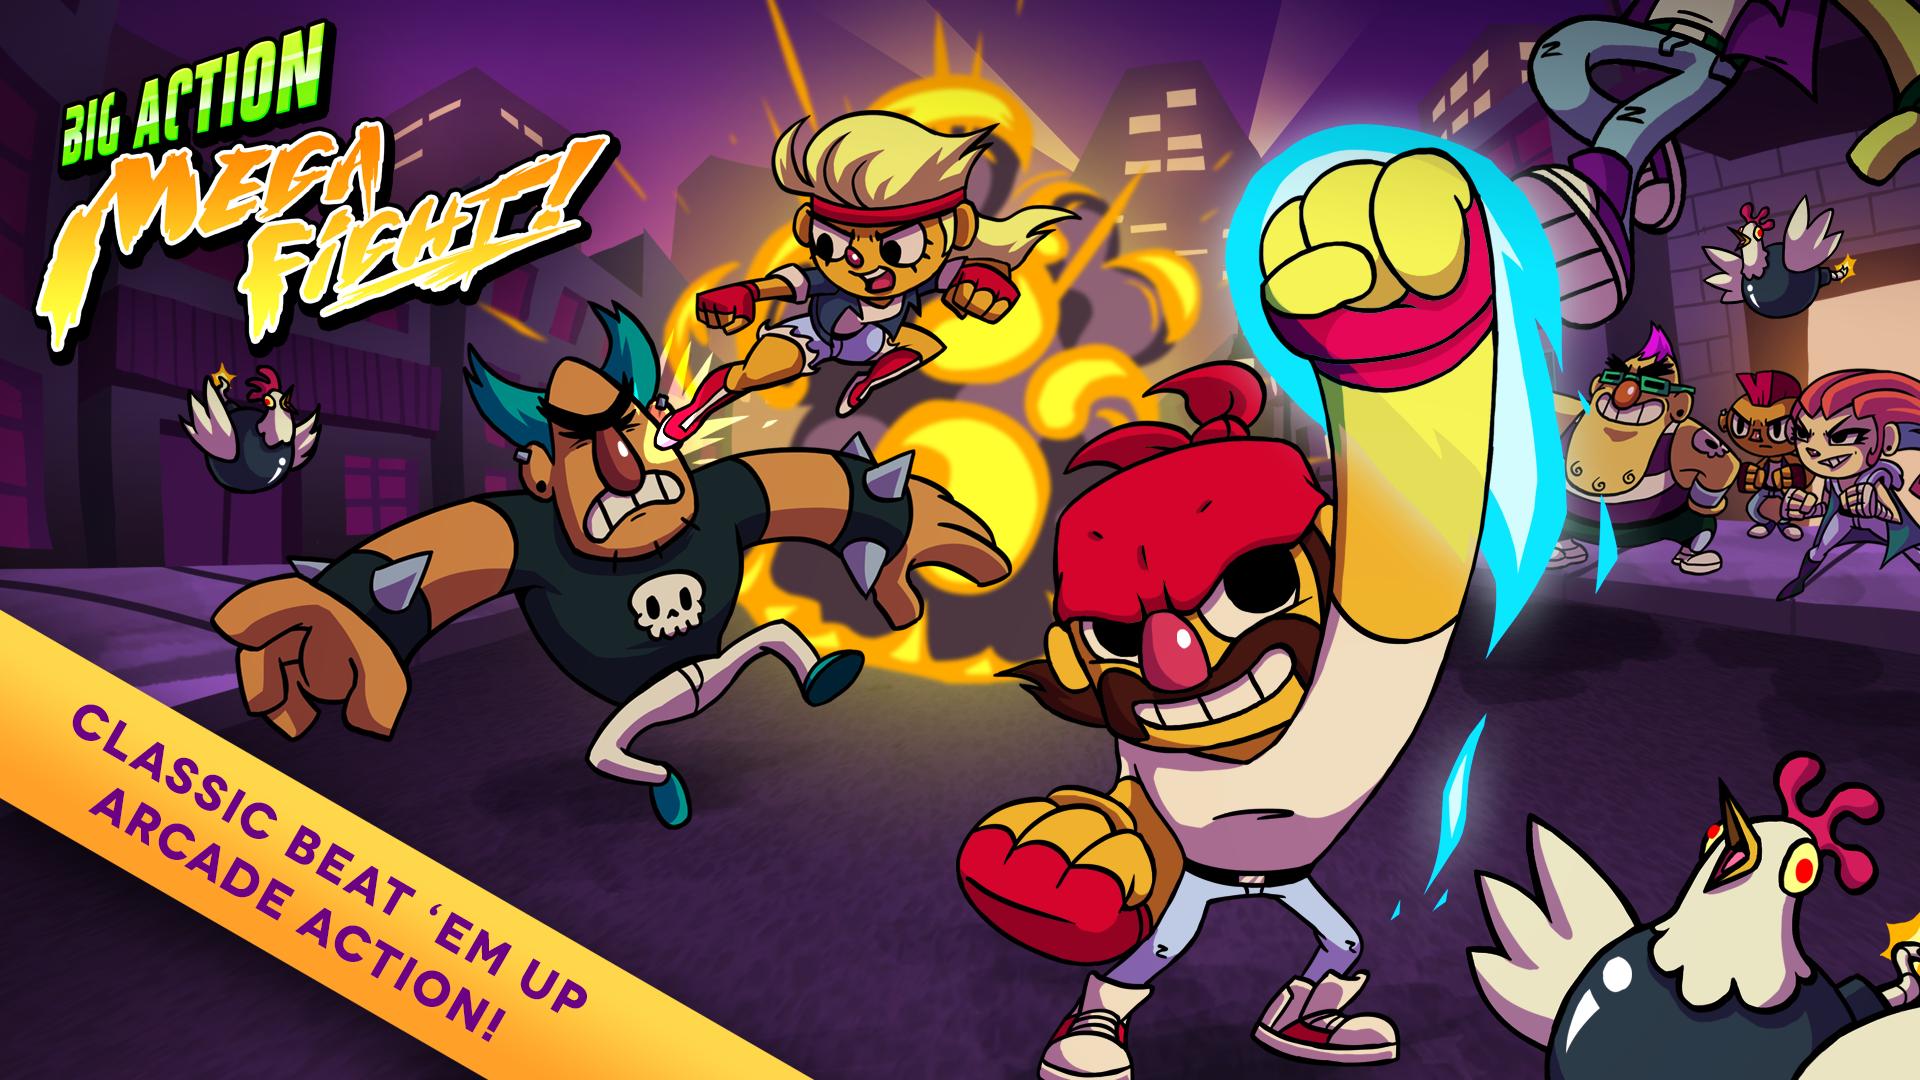 Big Action Mega Fight!